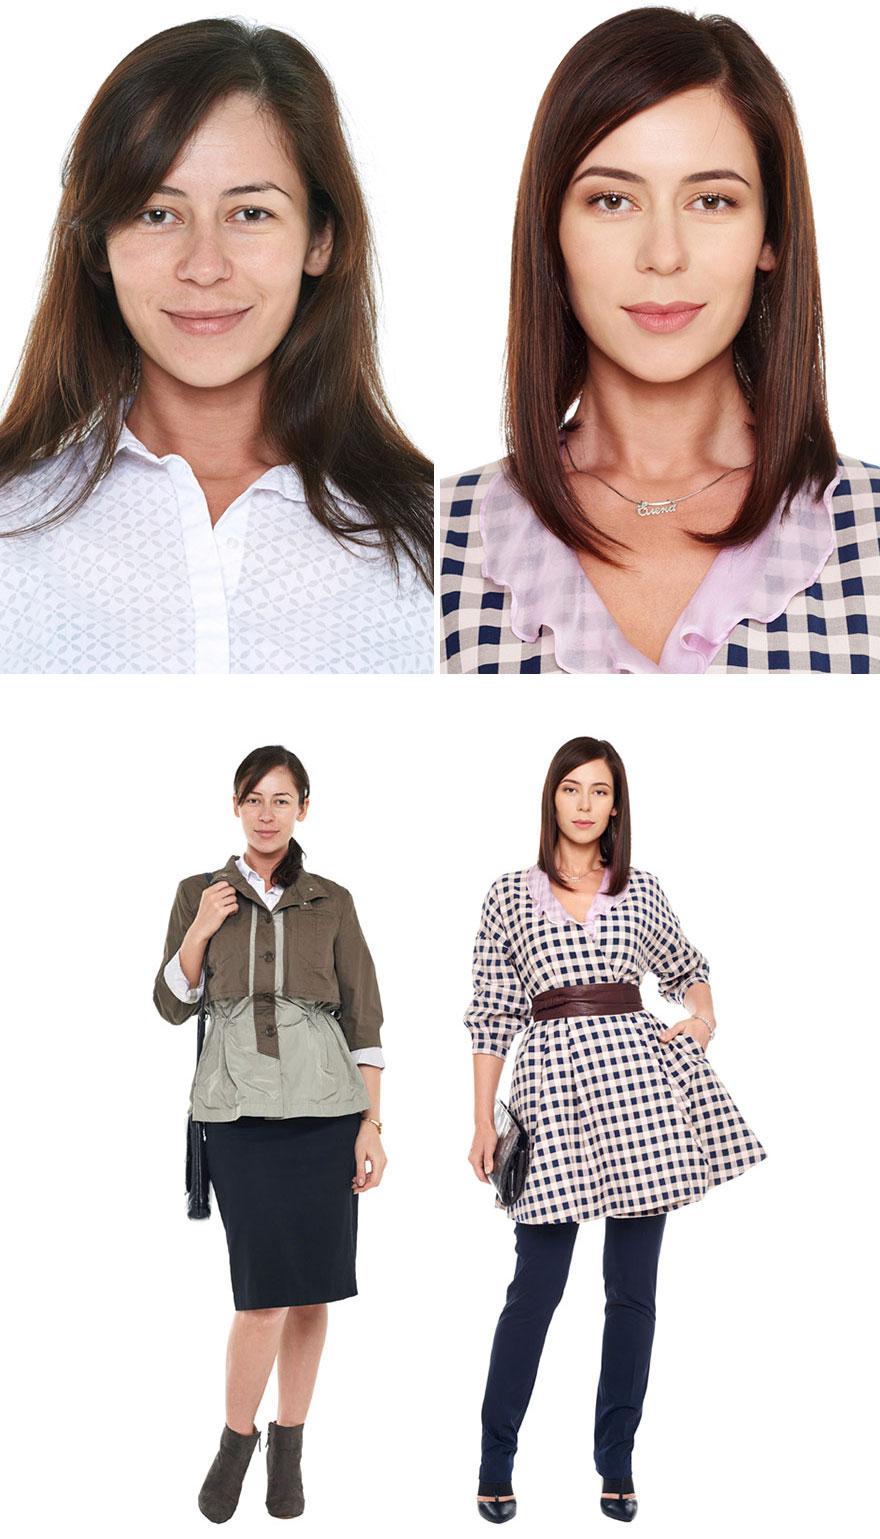 before-after-makeup-woman-style-change-konstantin-bogomolov-15